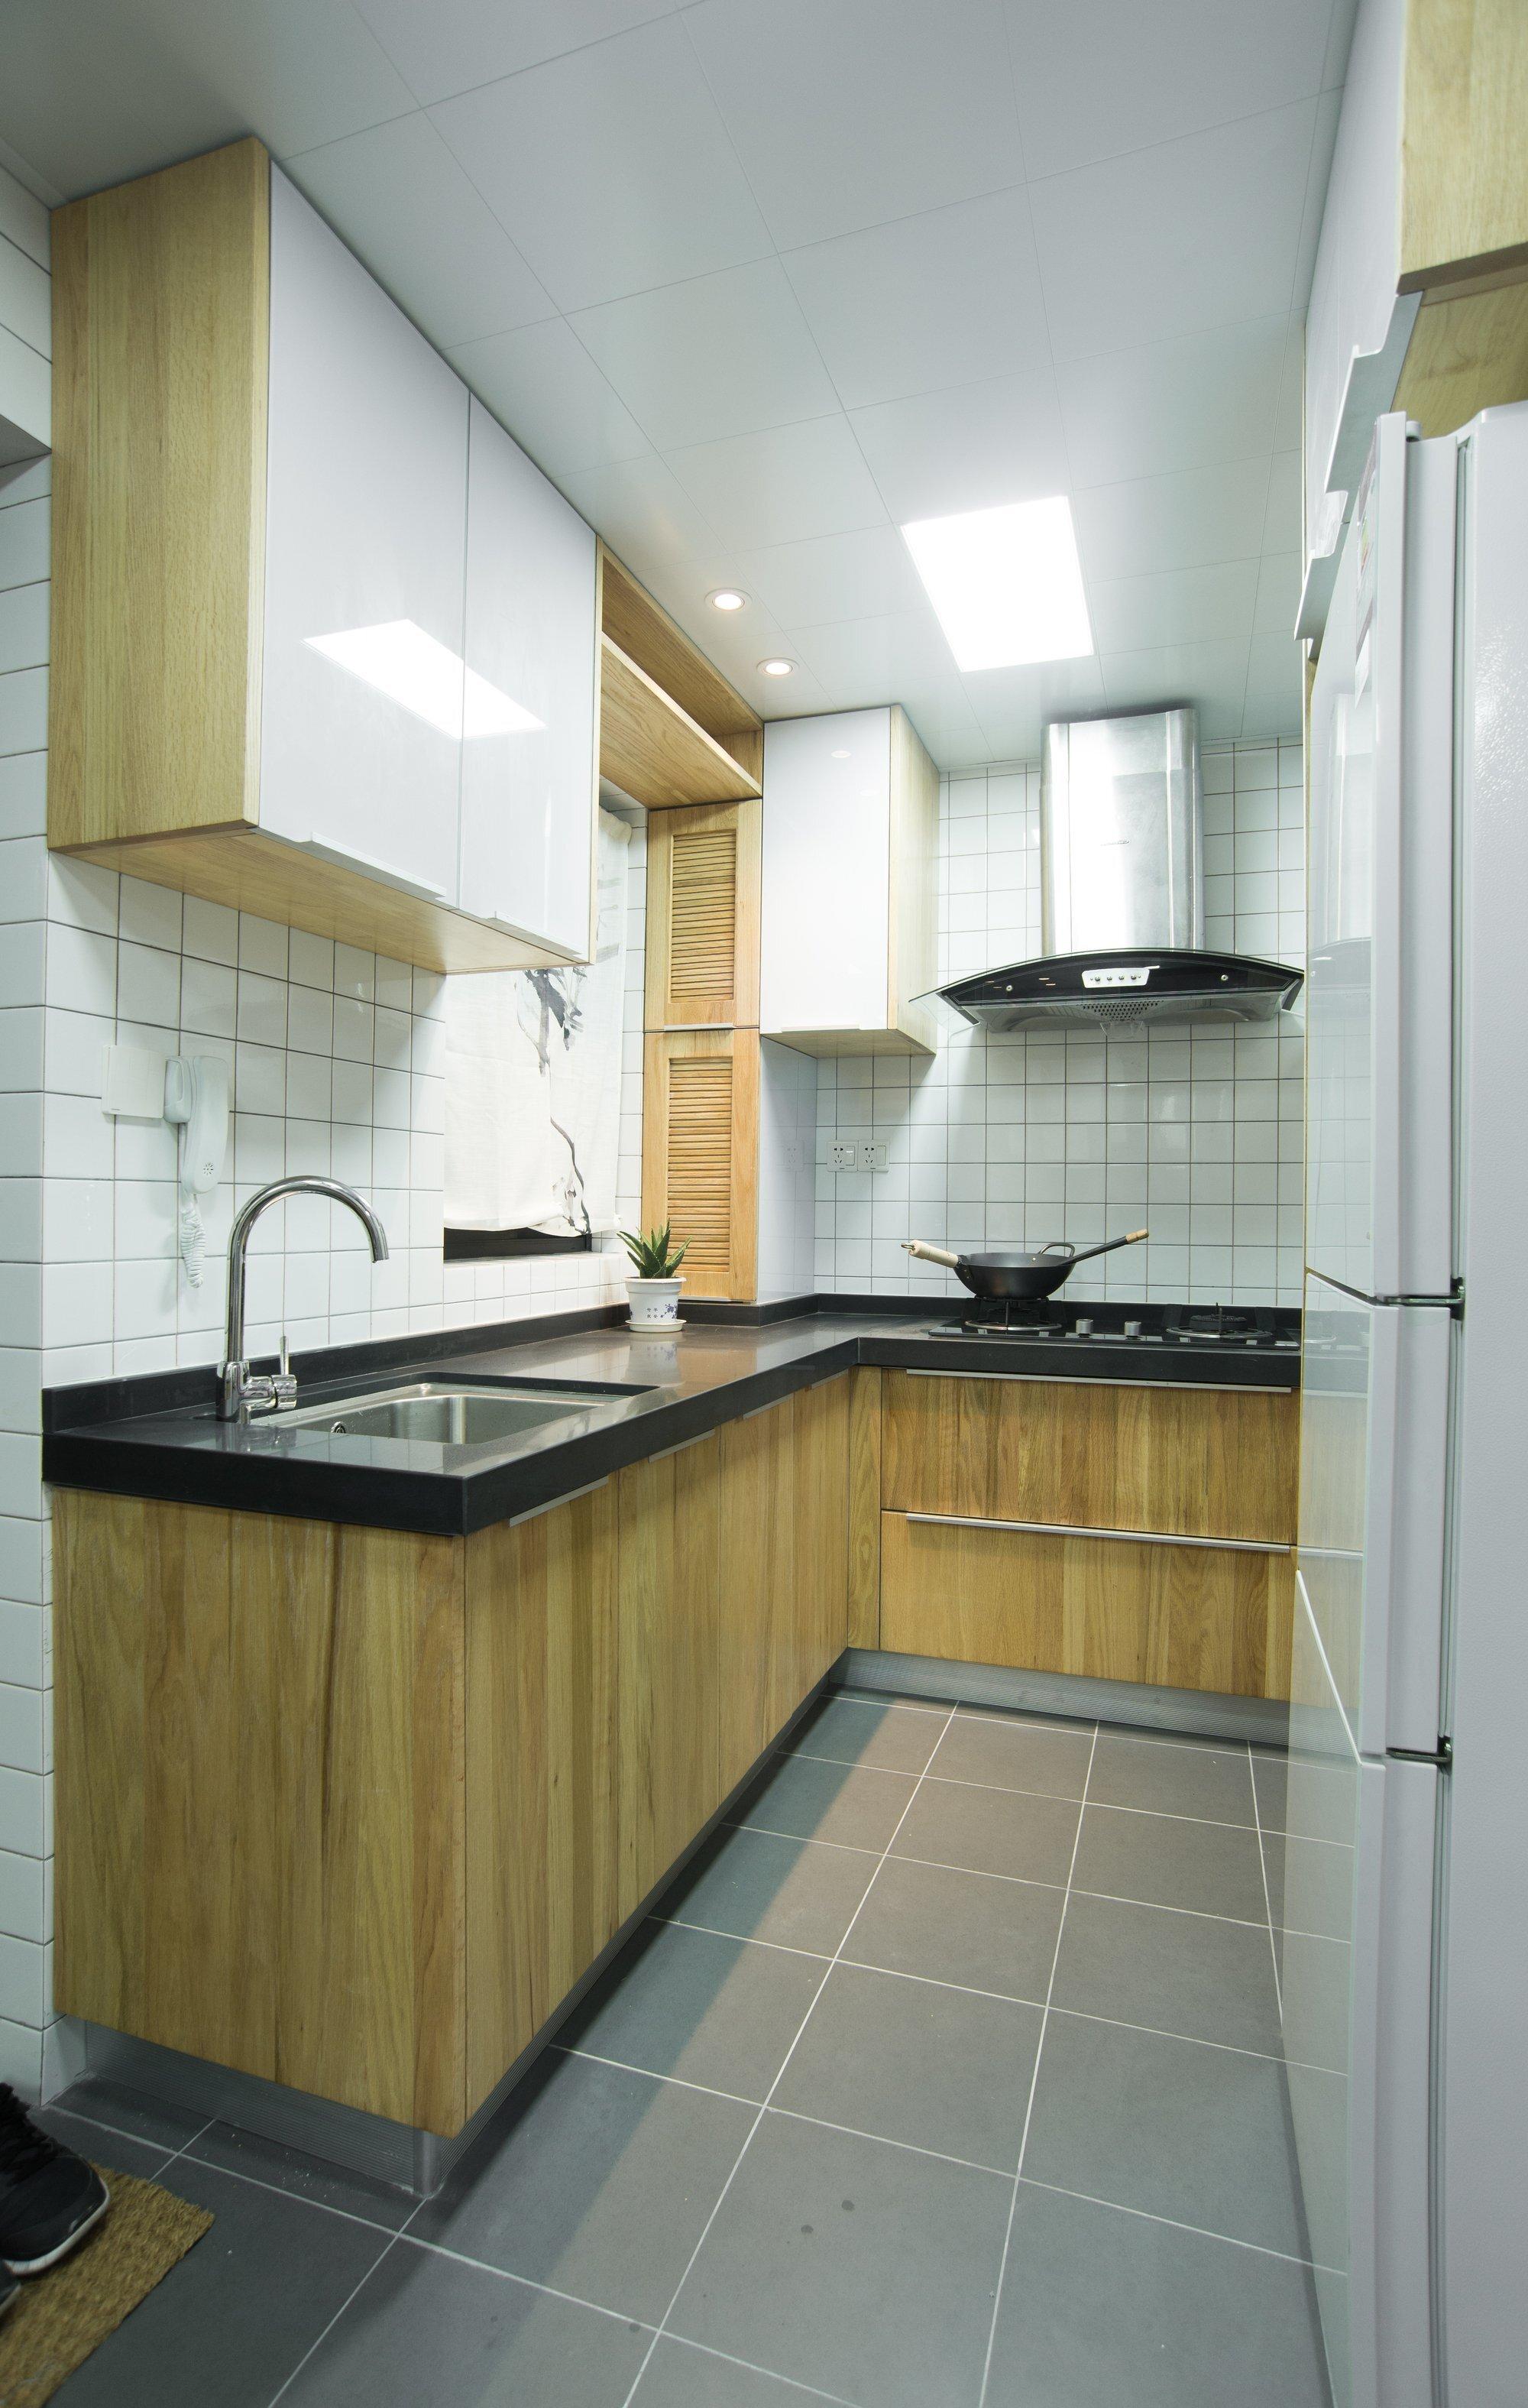 Traditional Chinese Home Design - Guo Donghai & Yan Linglin - Shanghai China - Kitchen - Humble Homes